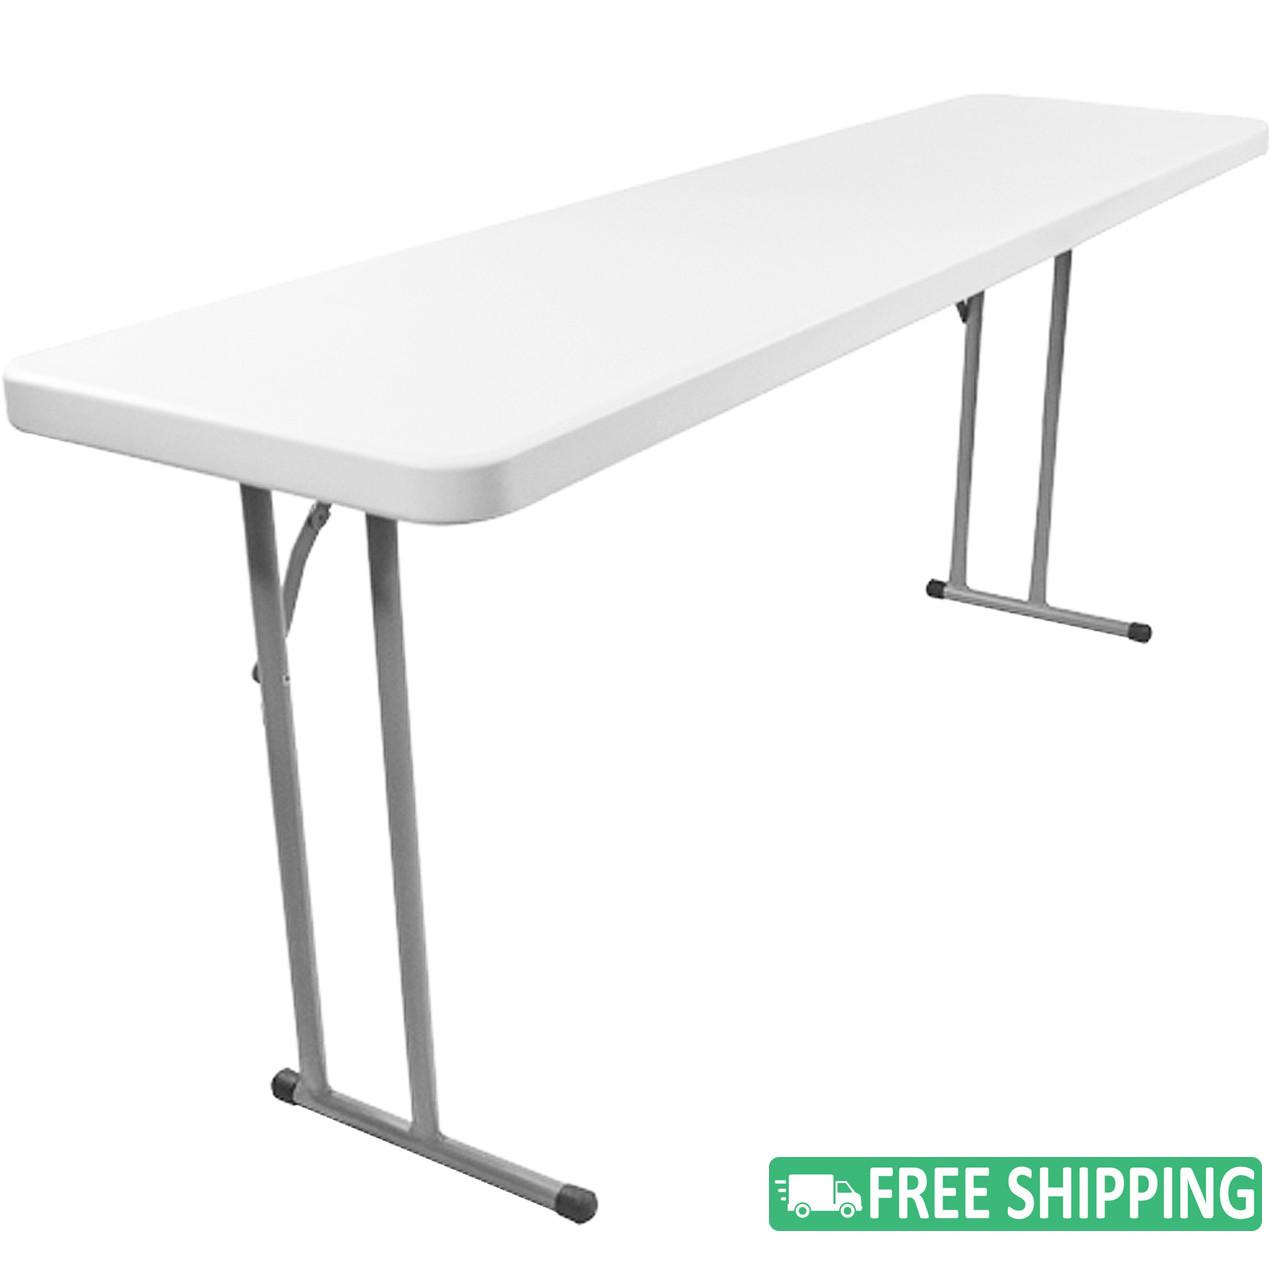 - Advantage 8' Folding Training Tables Classroom Essentials Online